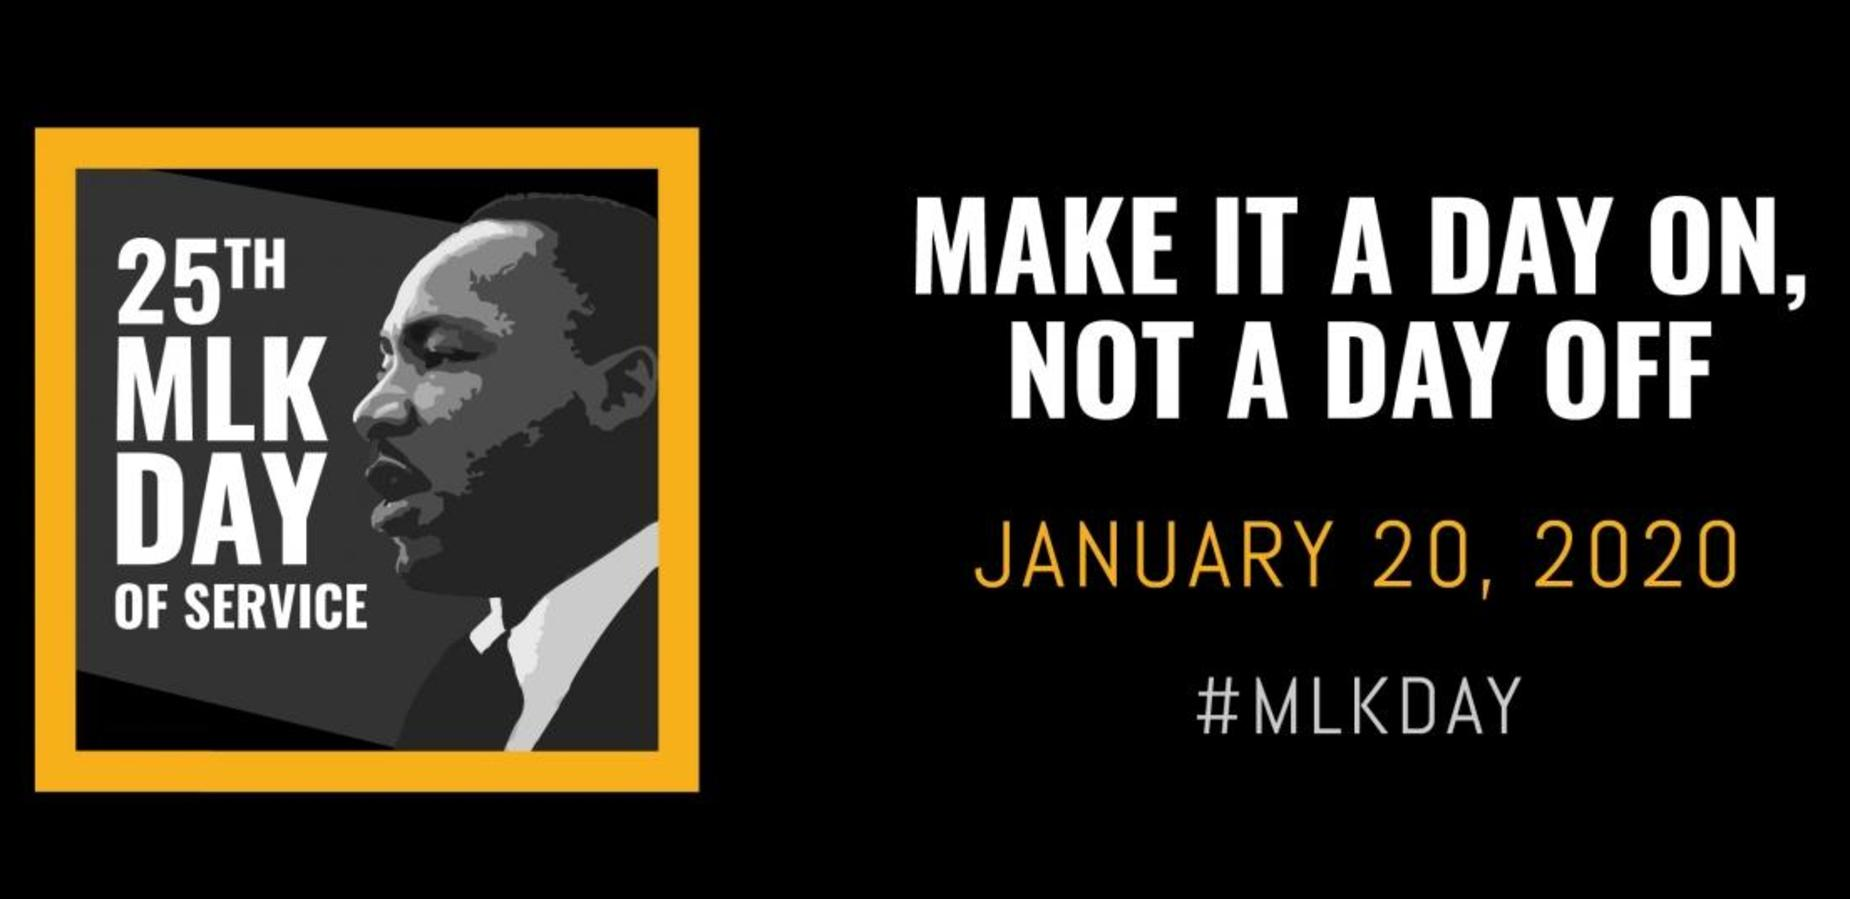 Make it a day on, not a day off. 25th MLK Day of Service. January 20, 2020 #MLKDAY